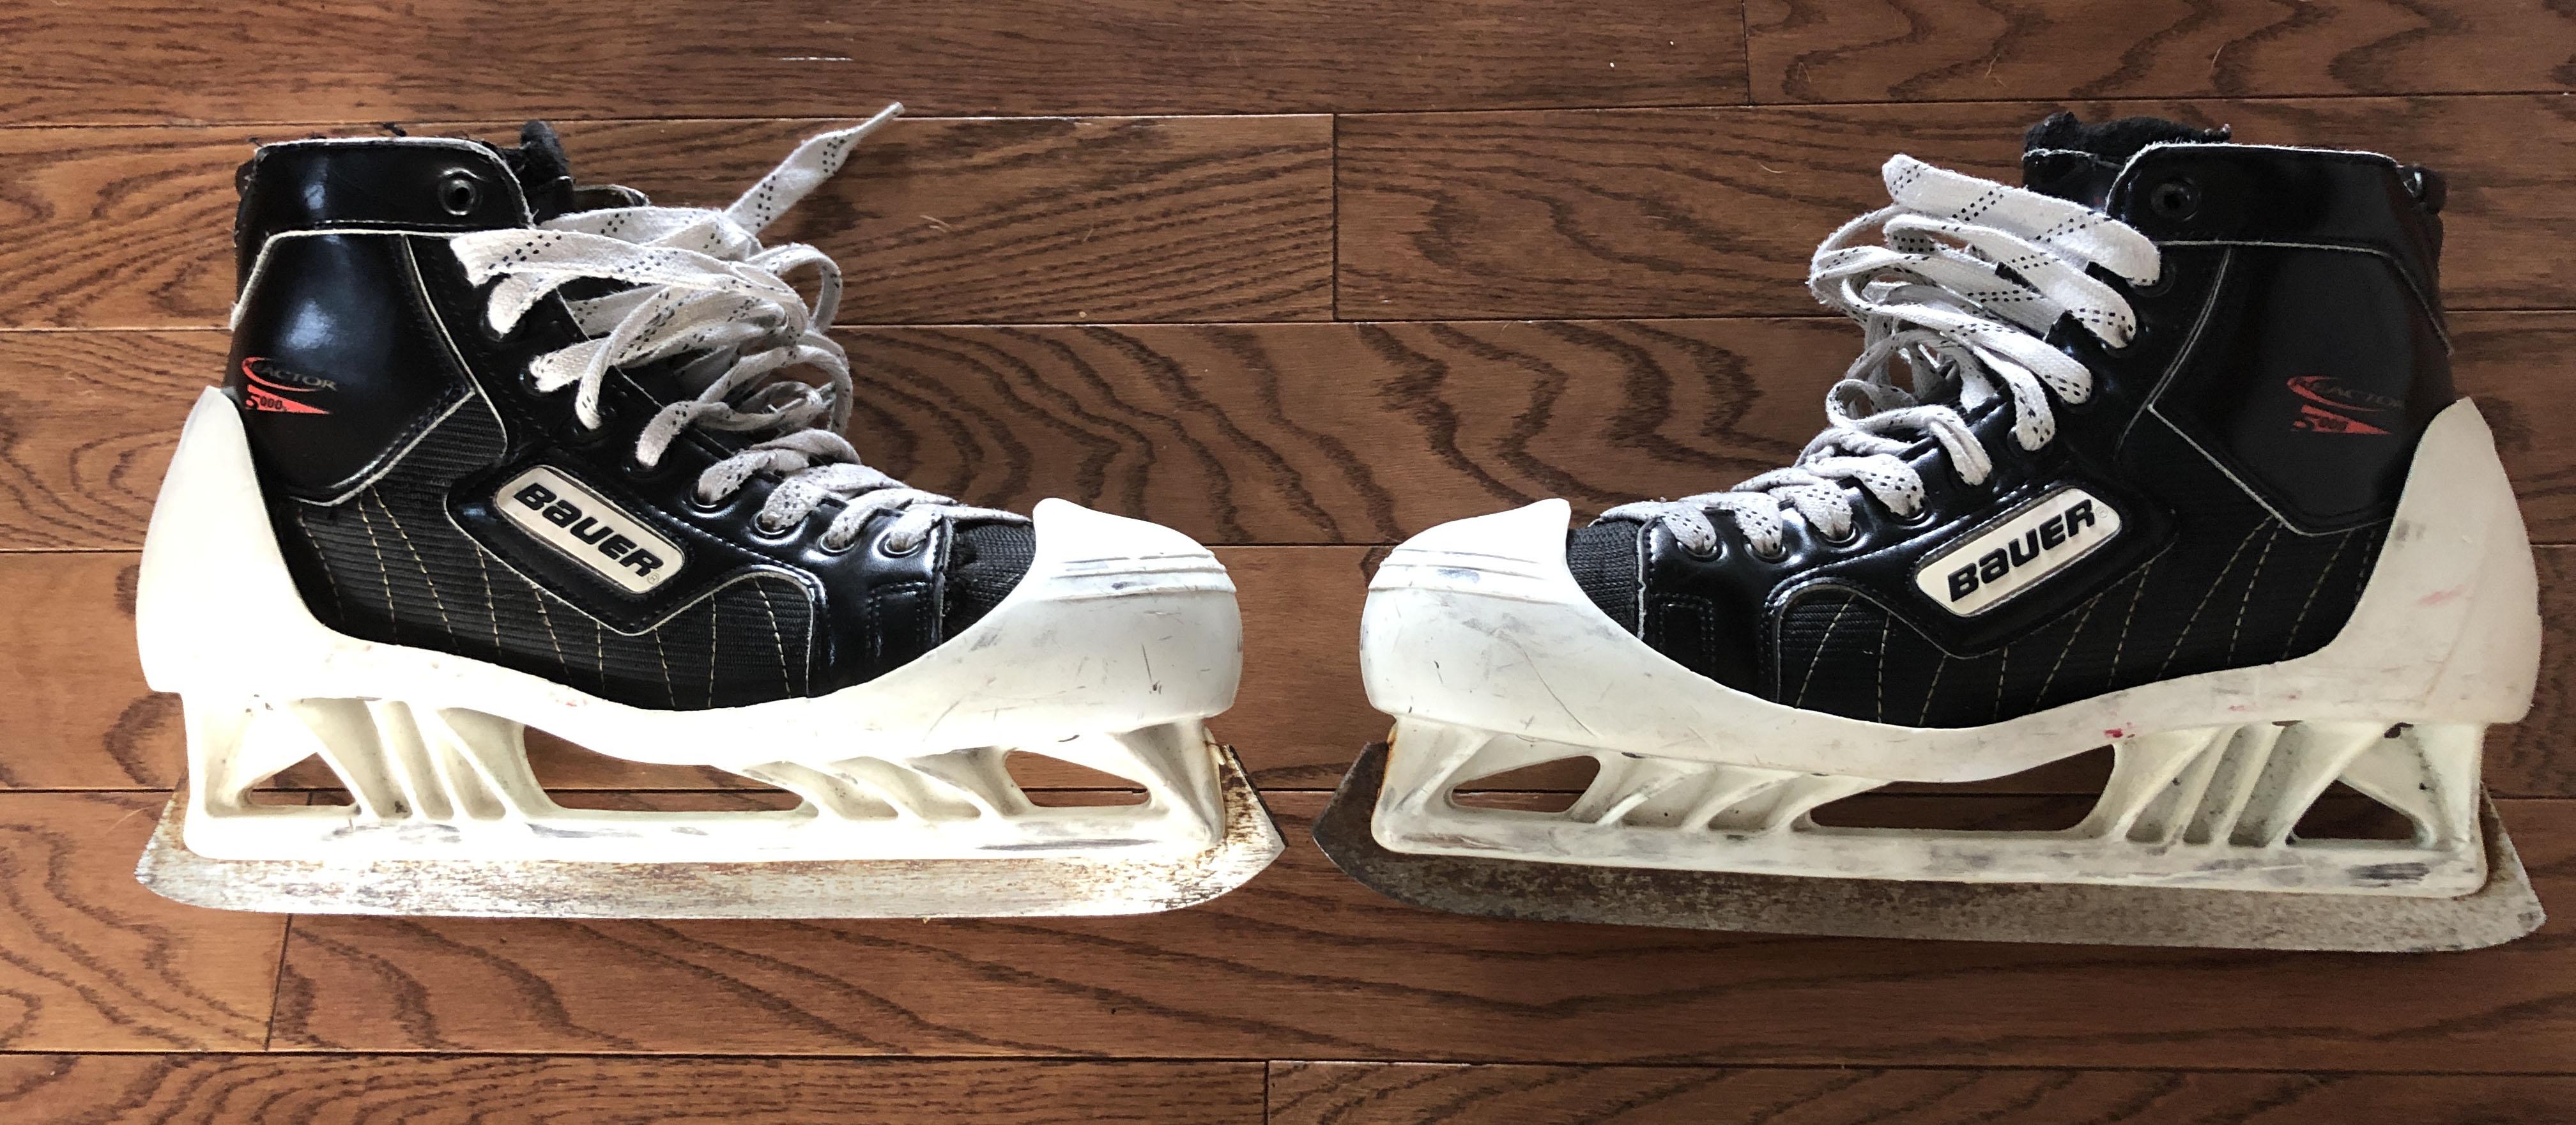 Bauer Goalie Skate Cowlings